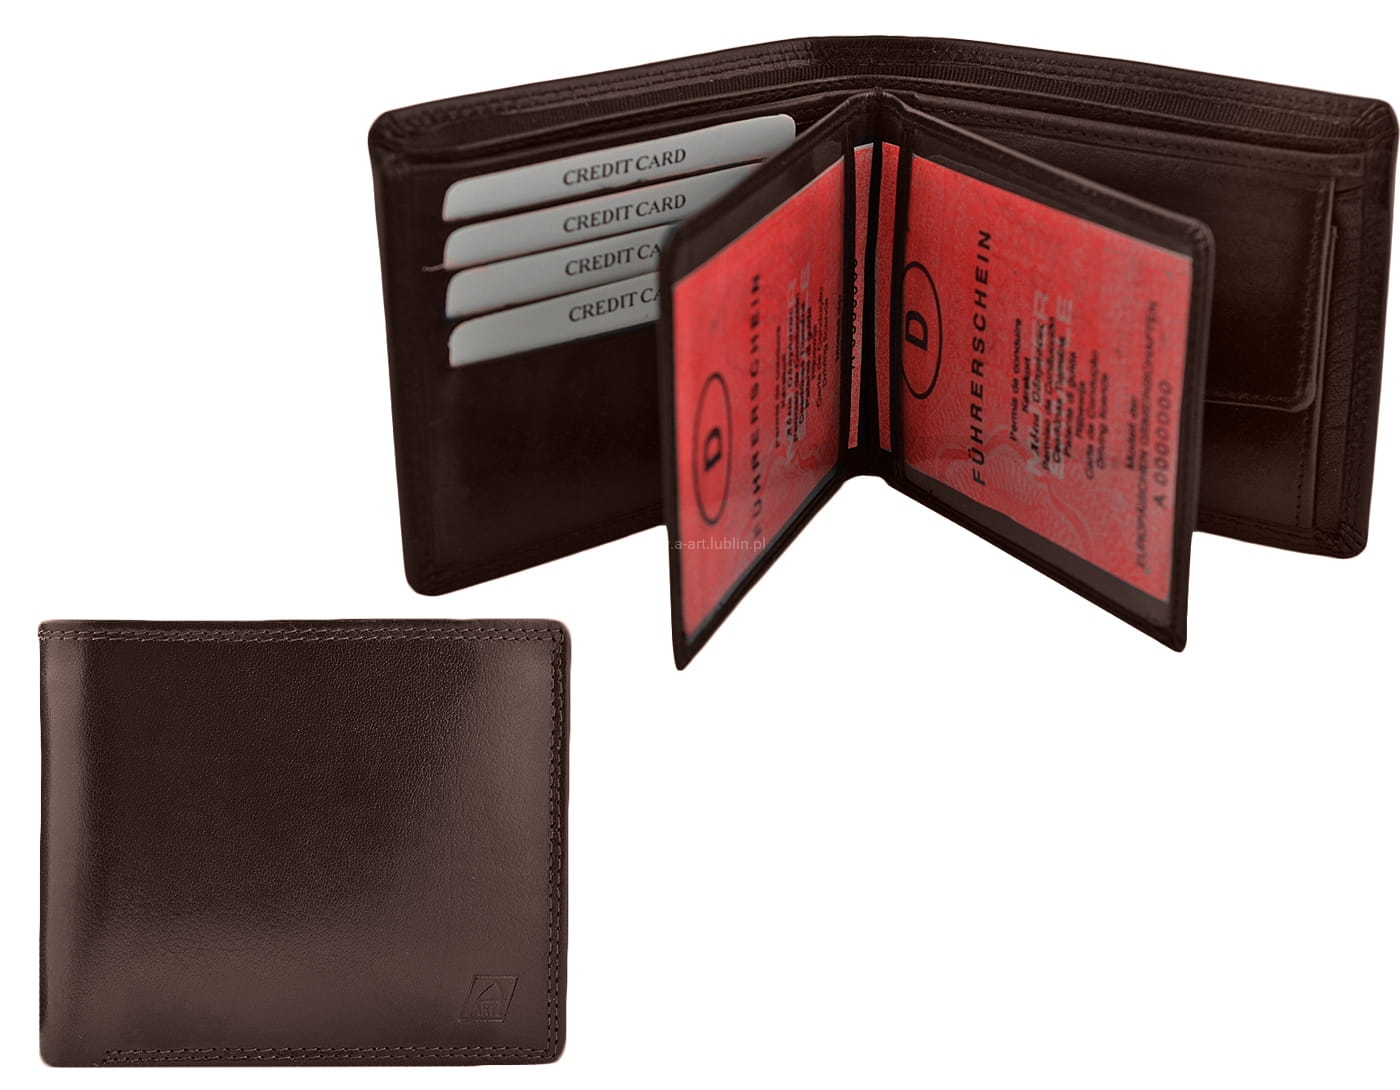 84dd96d3deaa4 Męski portfel skórzany elegancki i wygodny A-ART galanteria skórzana ...